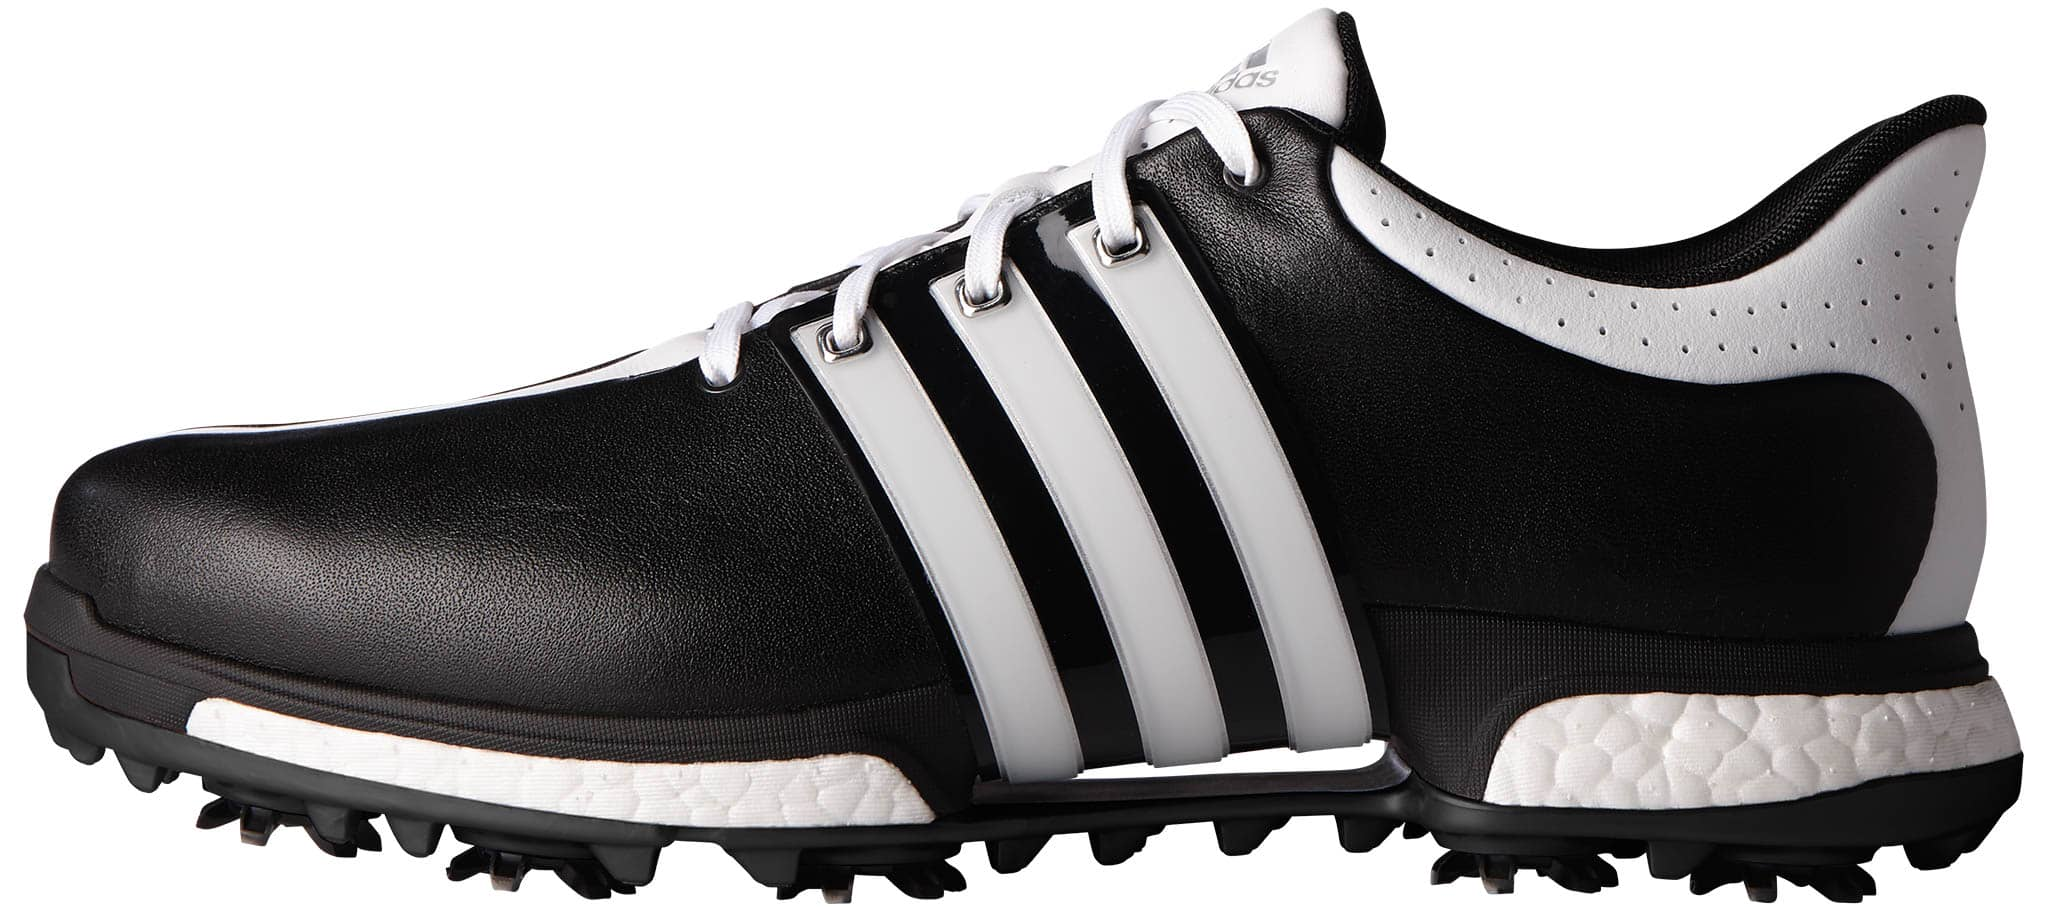 adidas h tour 360 boost white core black core black